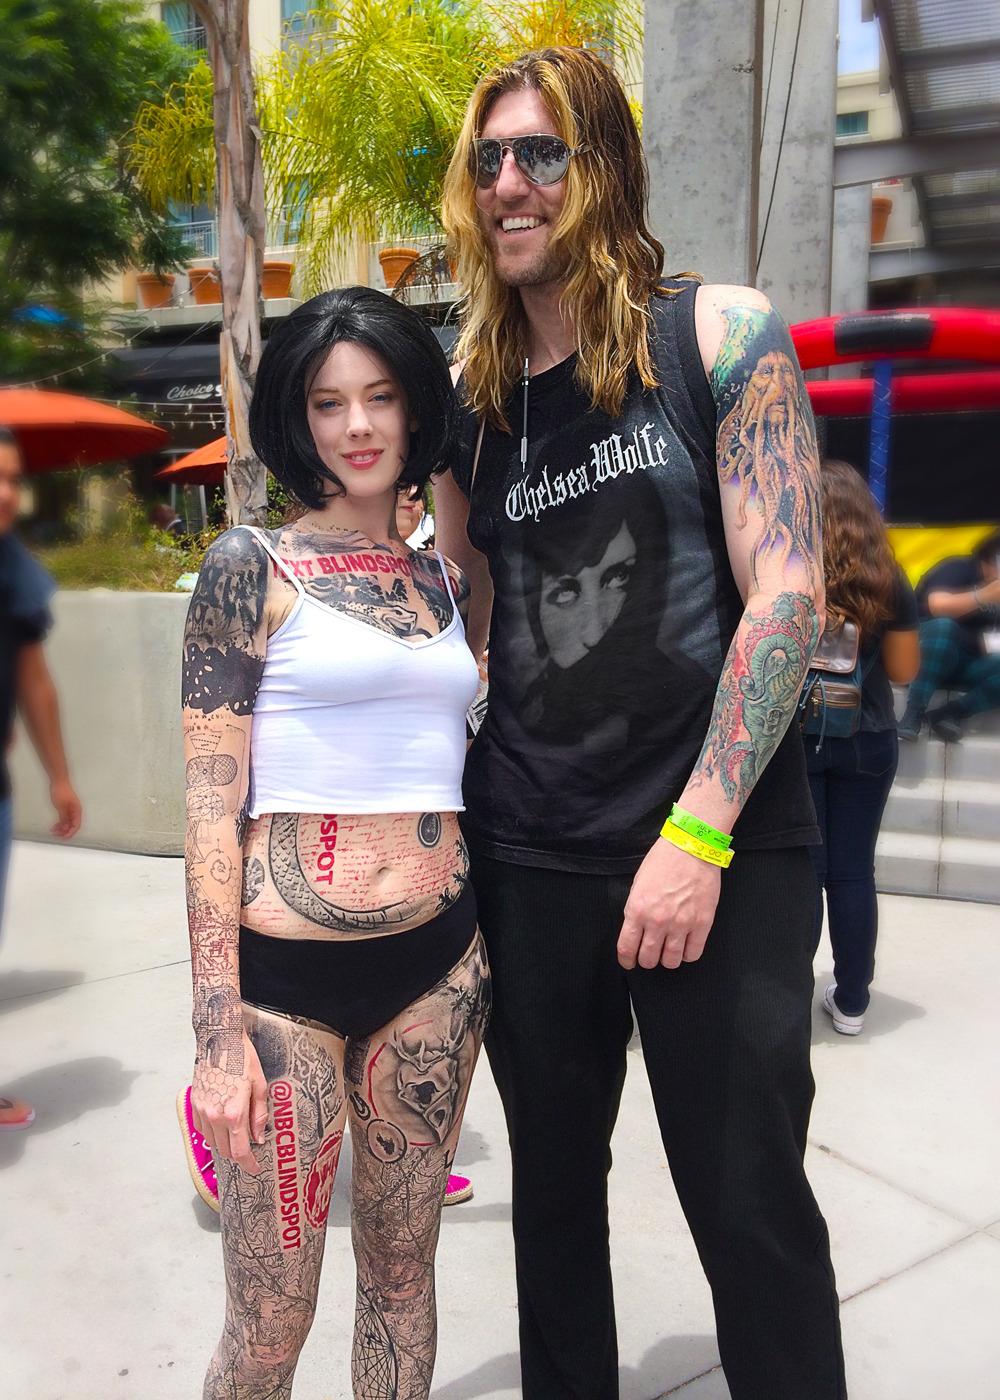 bryan-barnes-artist-davy-jones-tattoo-inked-girls-hot-tattoo-couple-comic-con-jane-doe-blindspot-amazing-tattoos-tattoo-girl_1000x1400.jpg